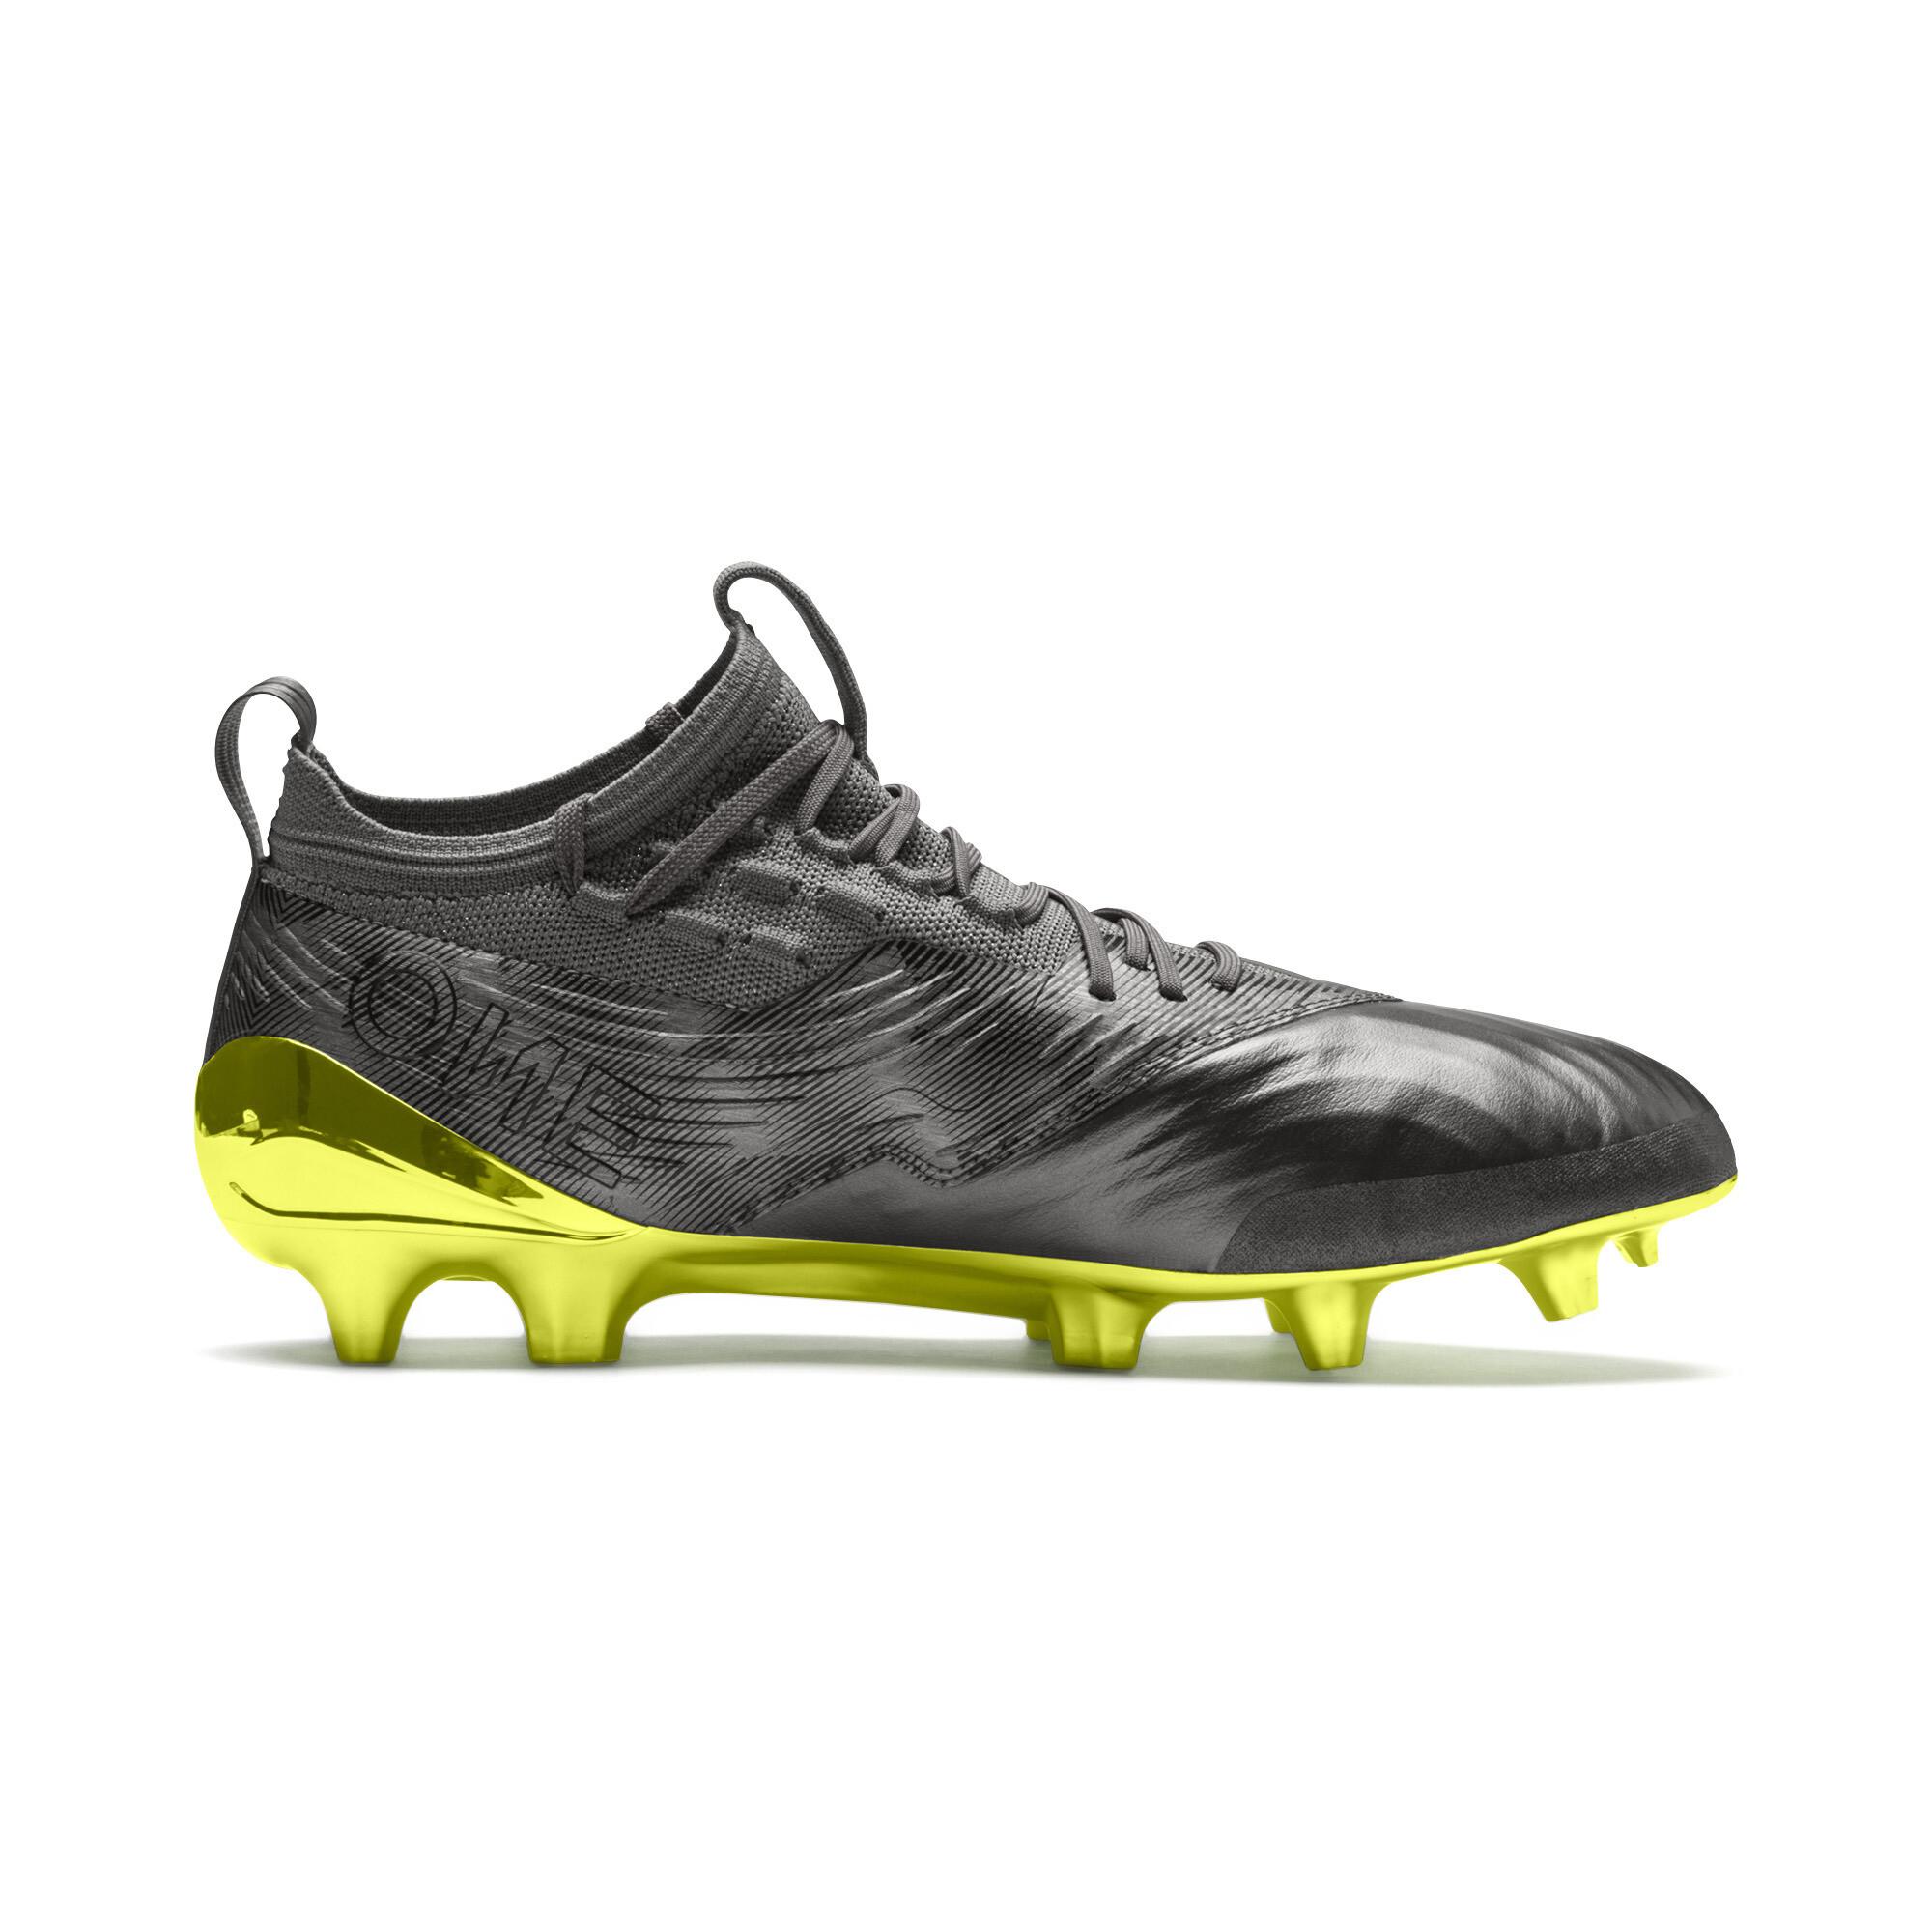 Image Puma PUMA ONE 19.1 Limited Edition FG/AG Men's Football Boots #5